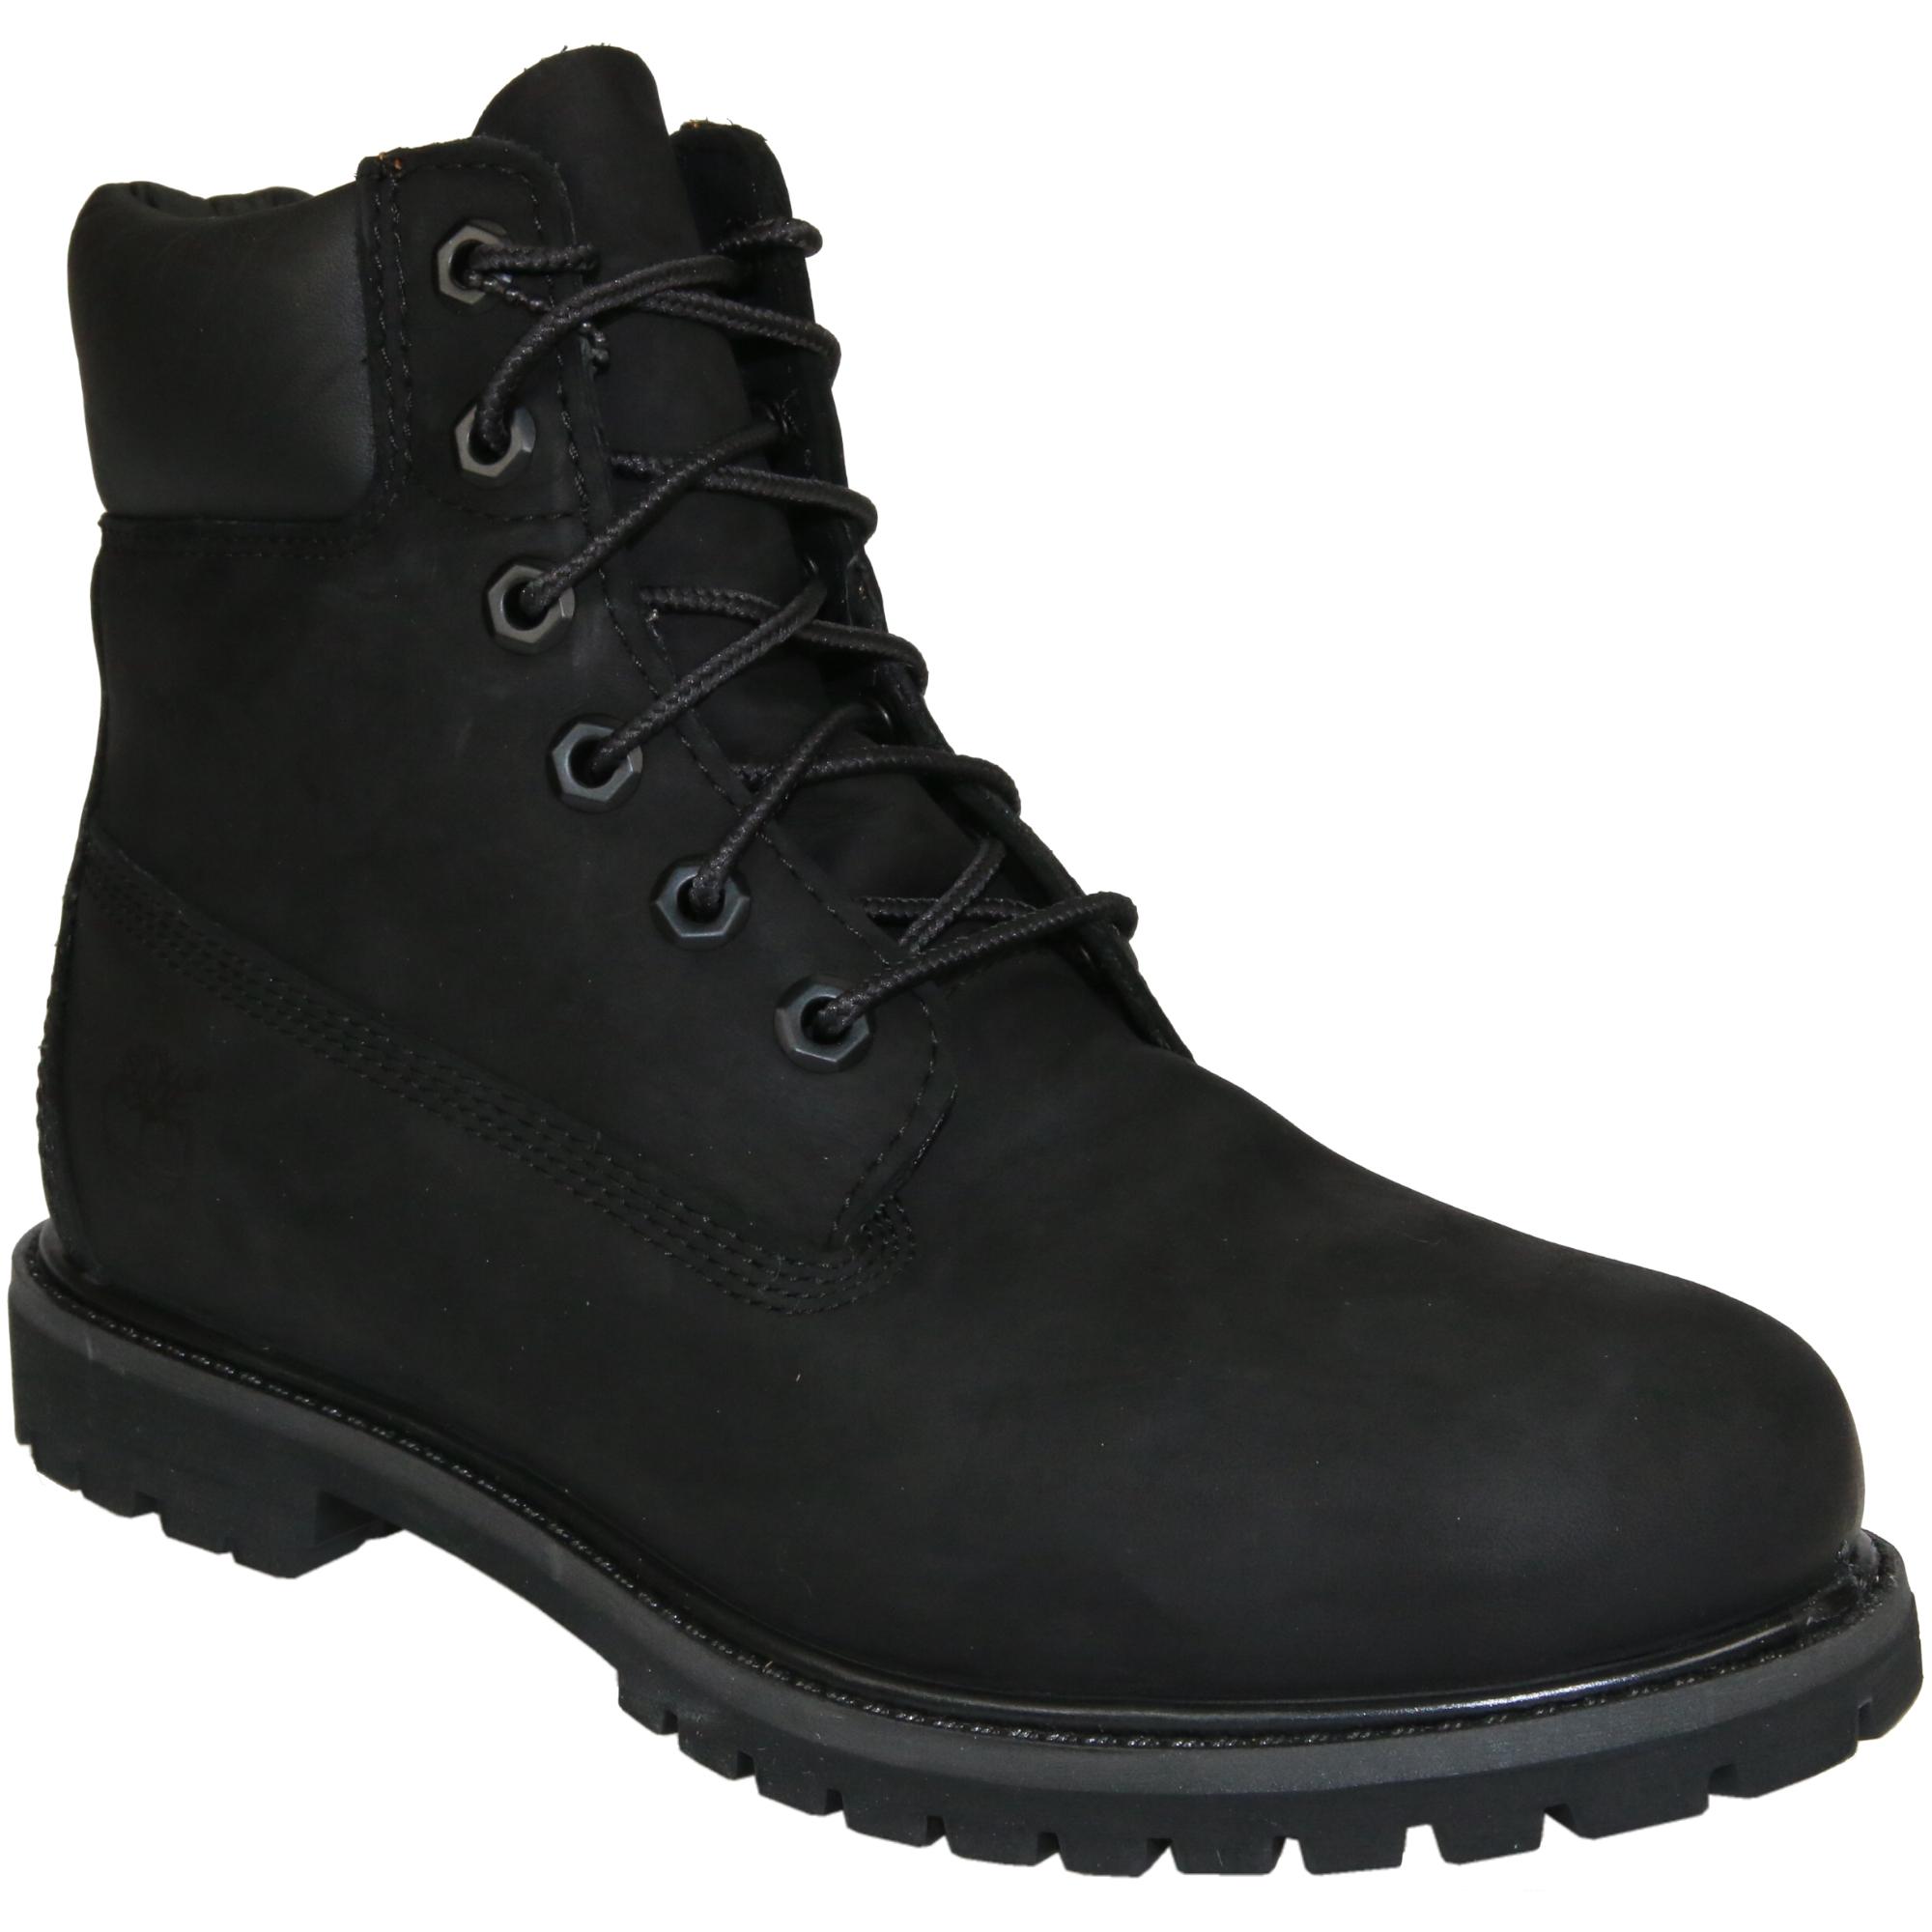 Timberland 6 Inch Premium Boot Schuhe Stiefel